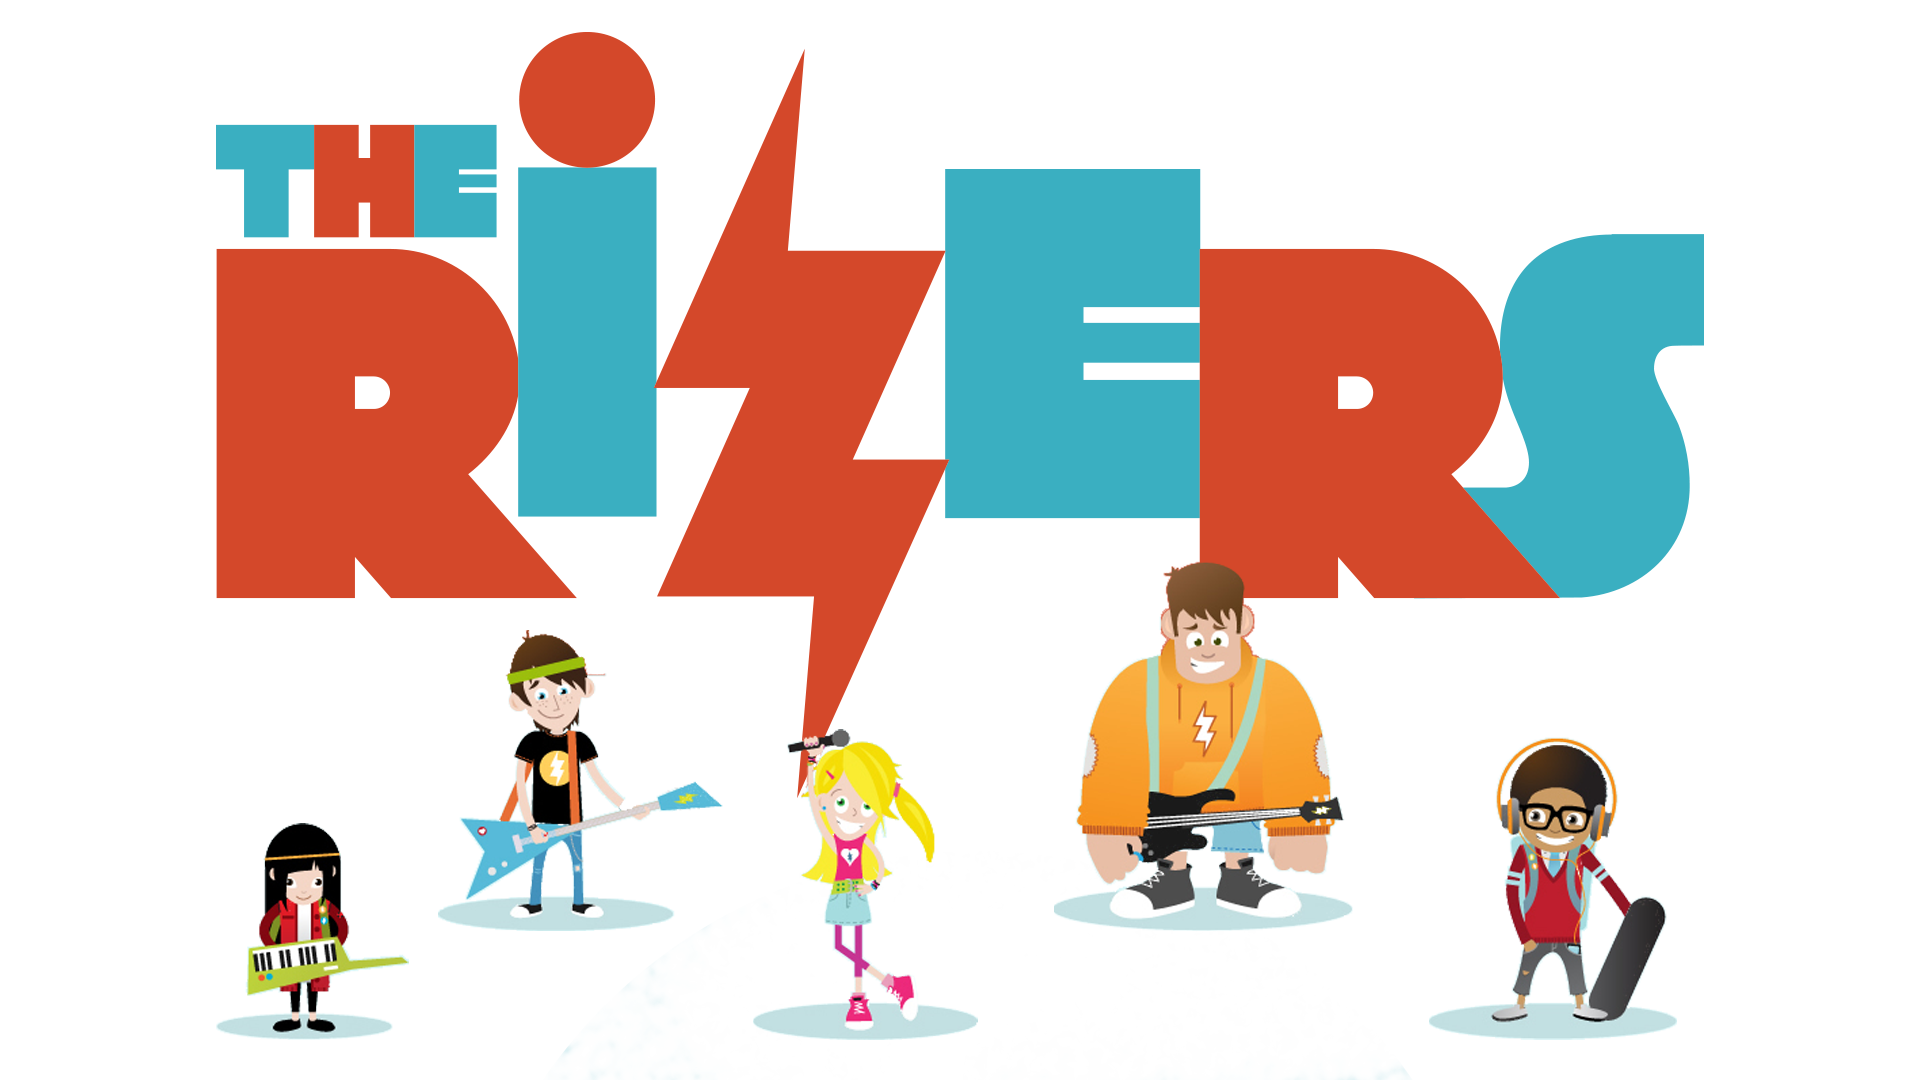 Rizers logo